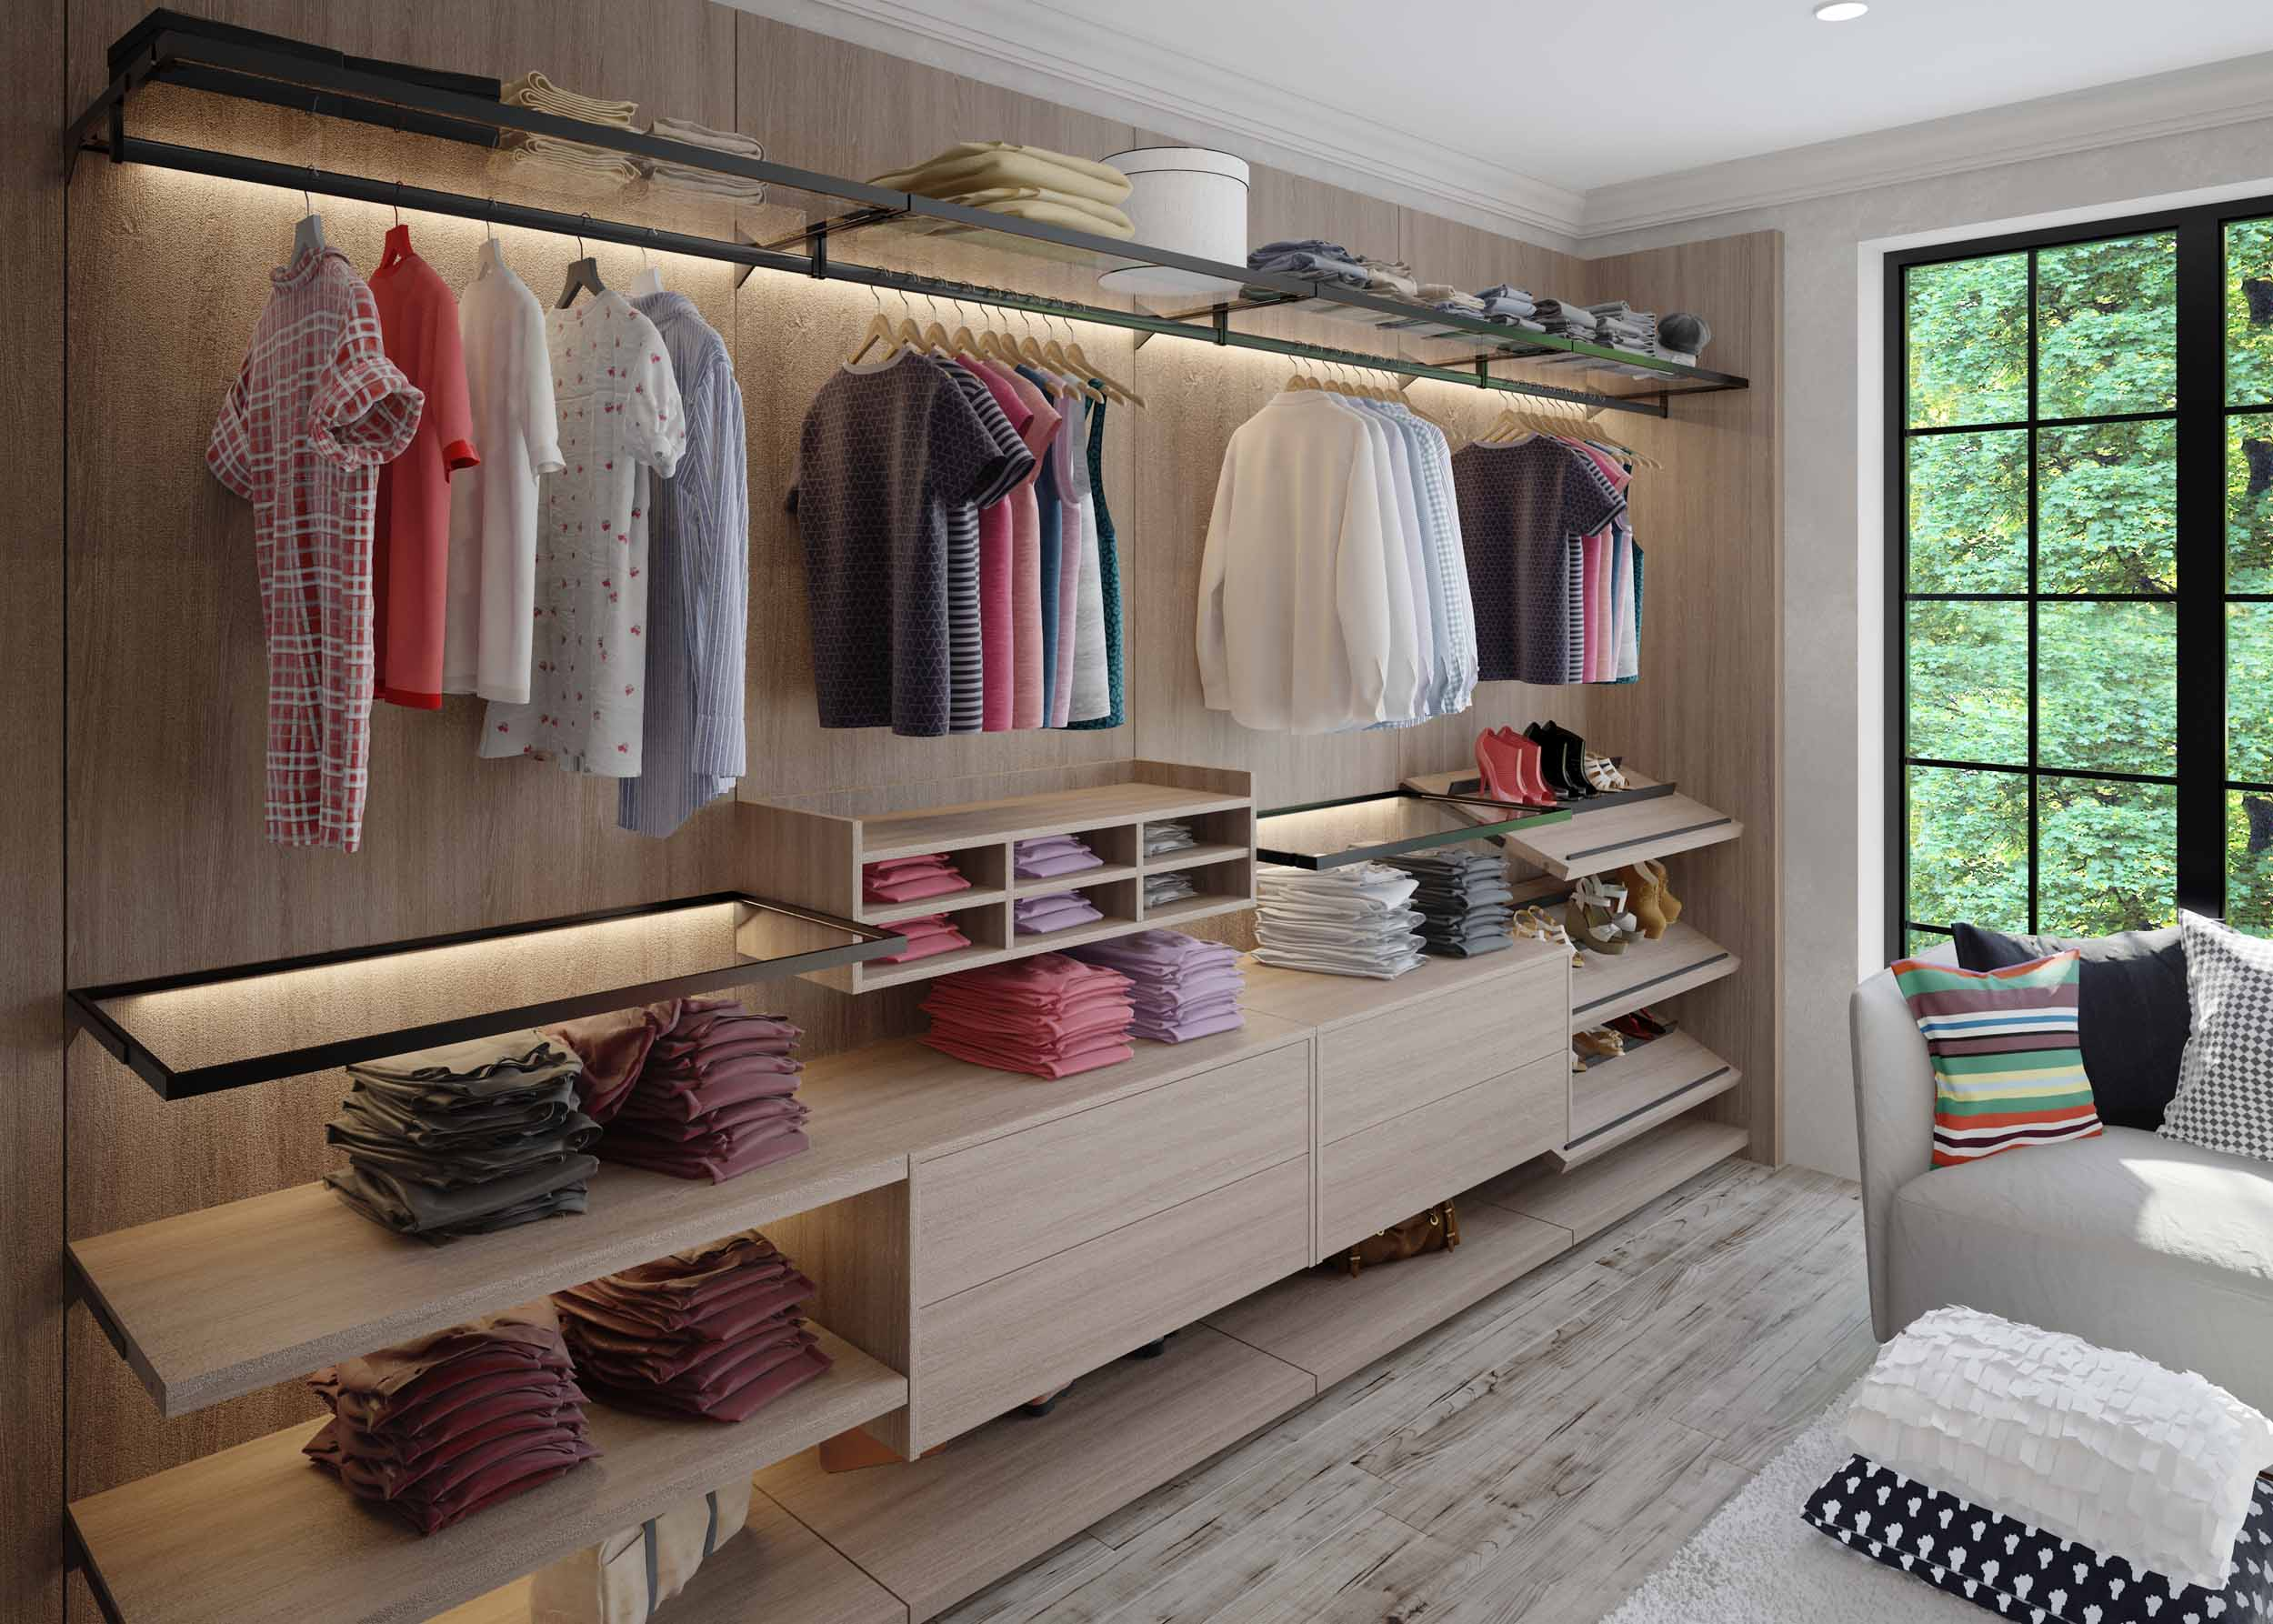 Linear Walkin wardrobe with vertiko profile woodgrain finish